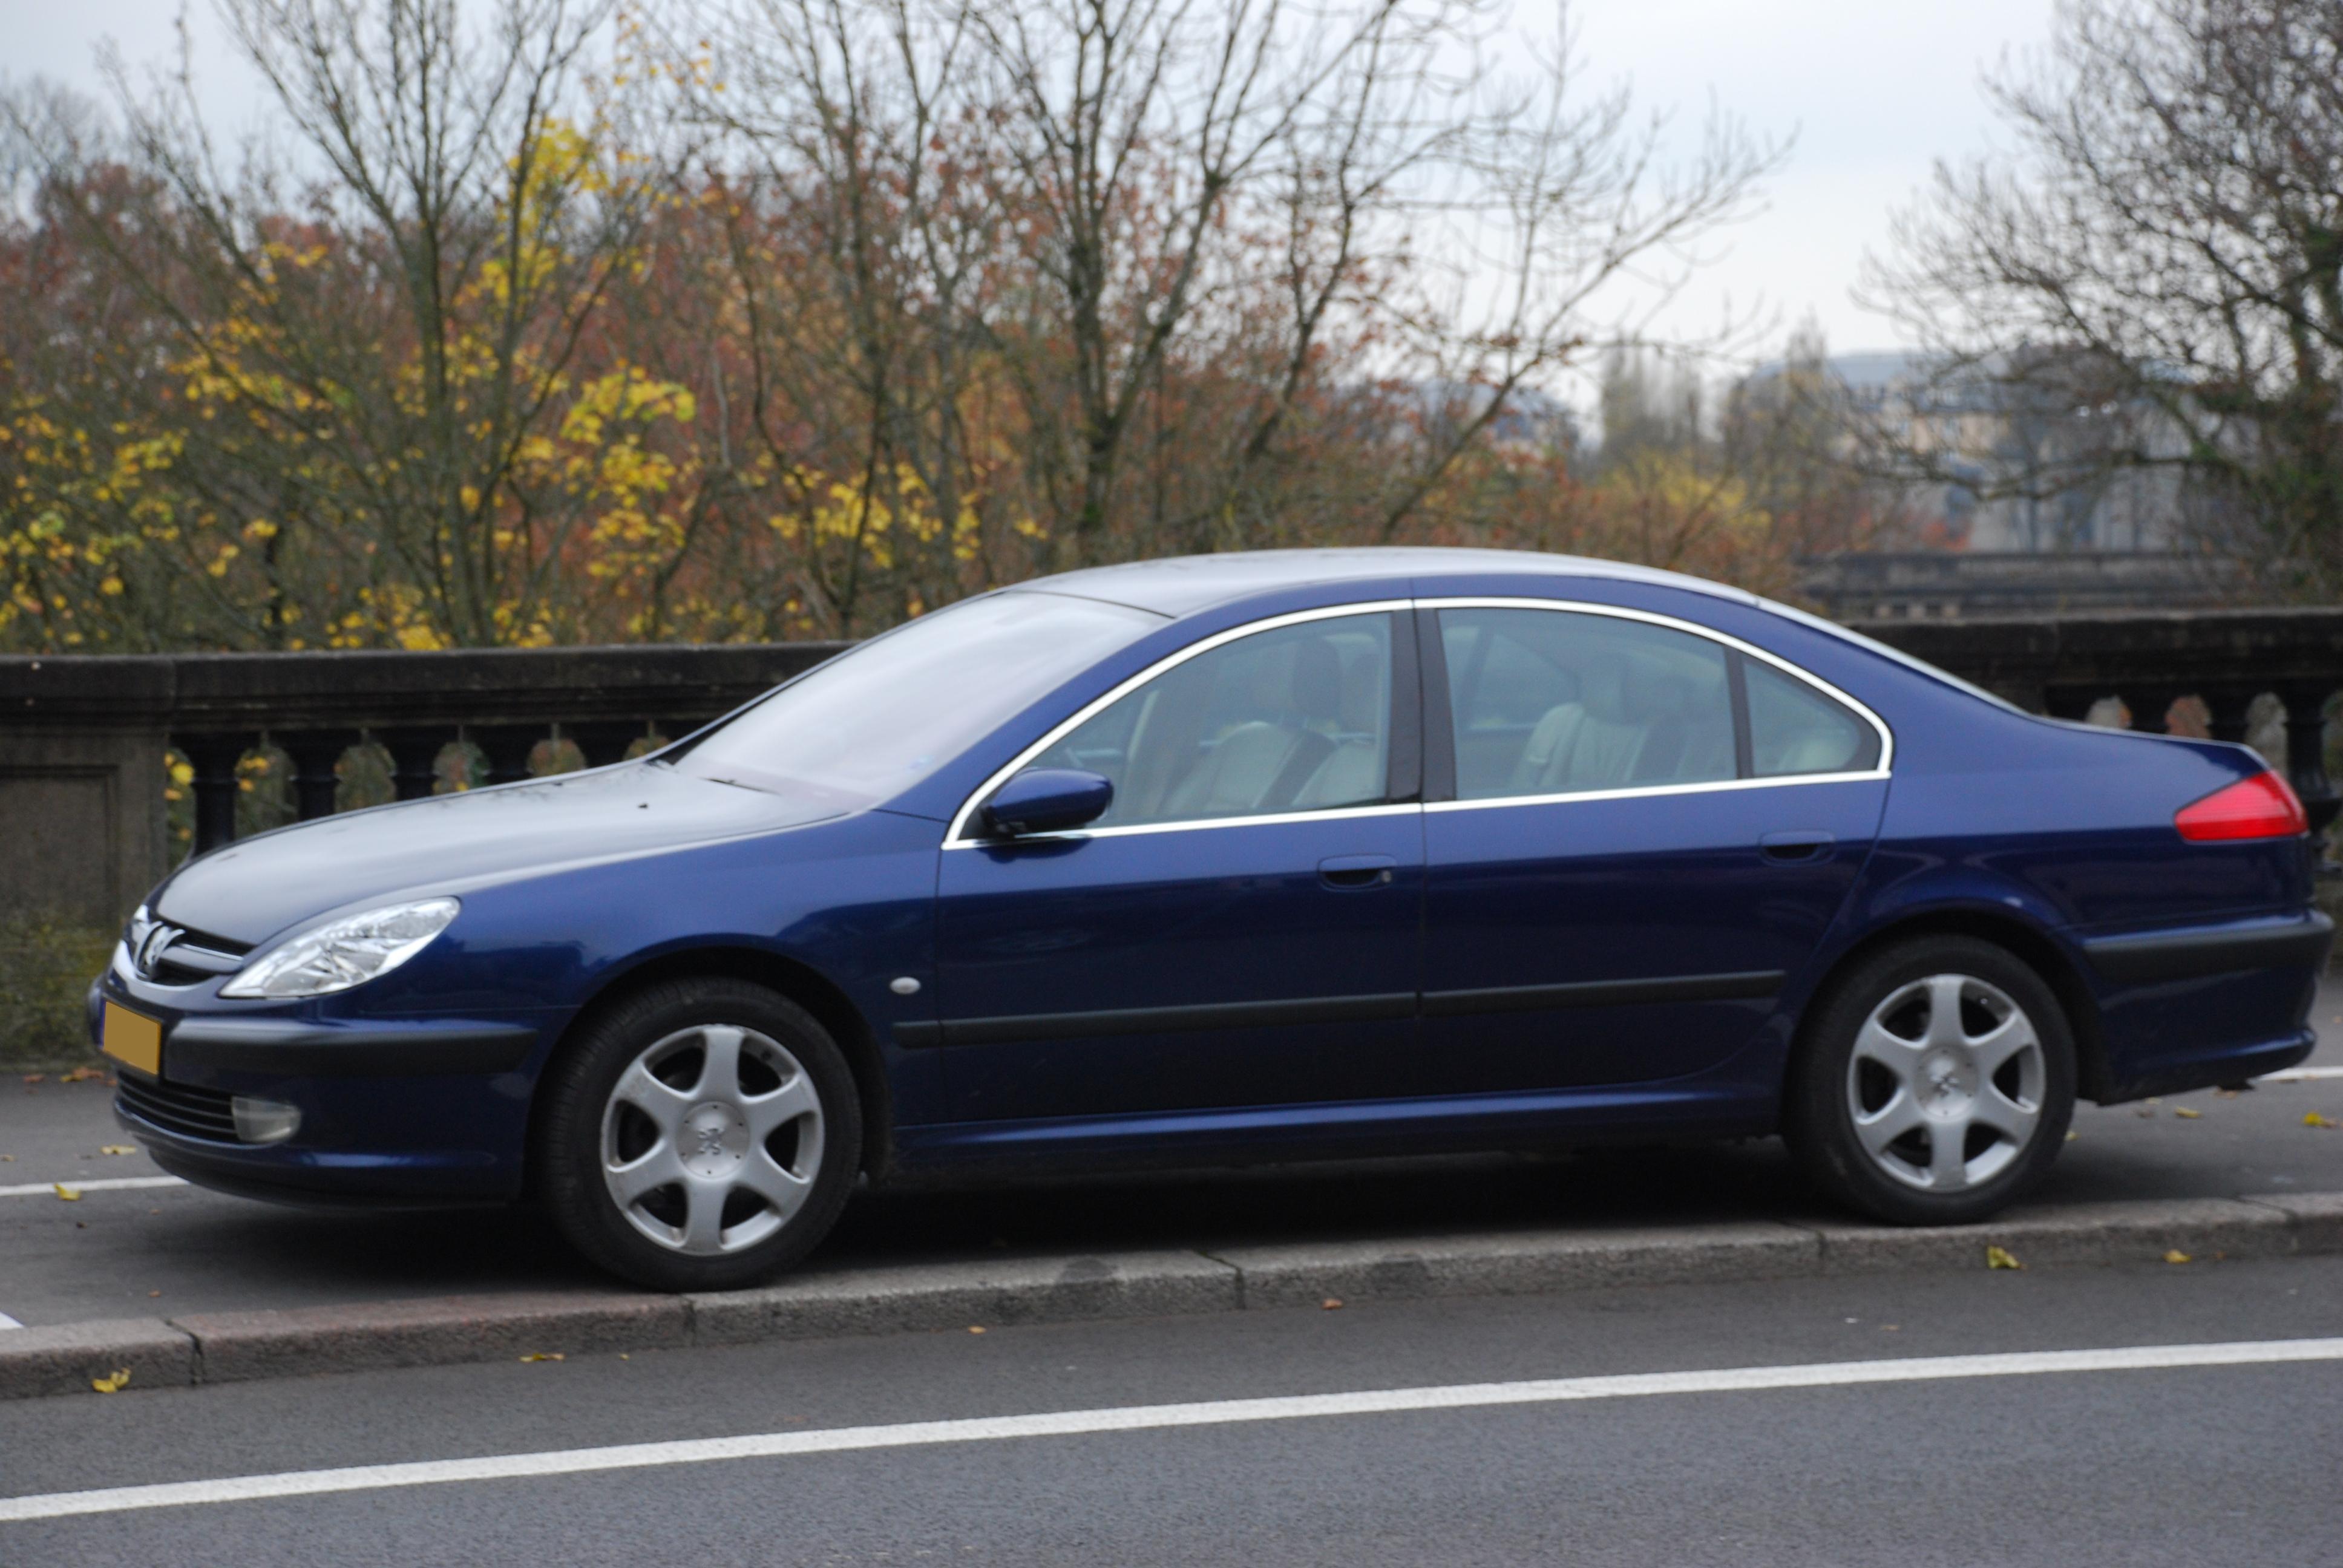 File:Peugeot 607-Luxemburg-1.jpg